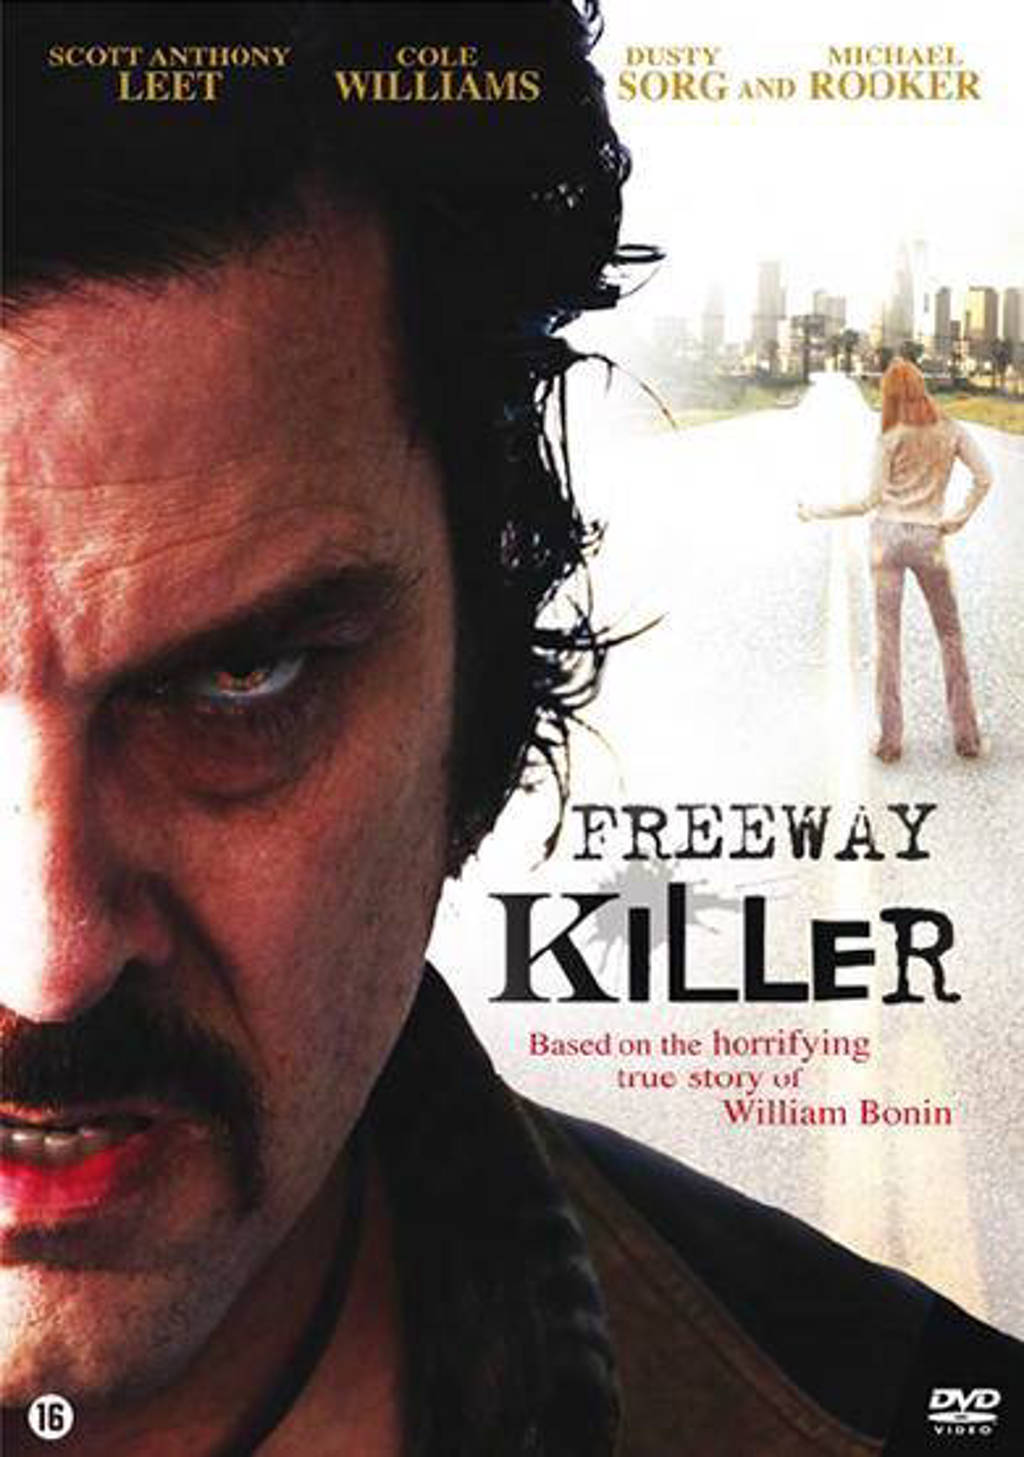 Freeway killer (DVD)